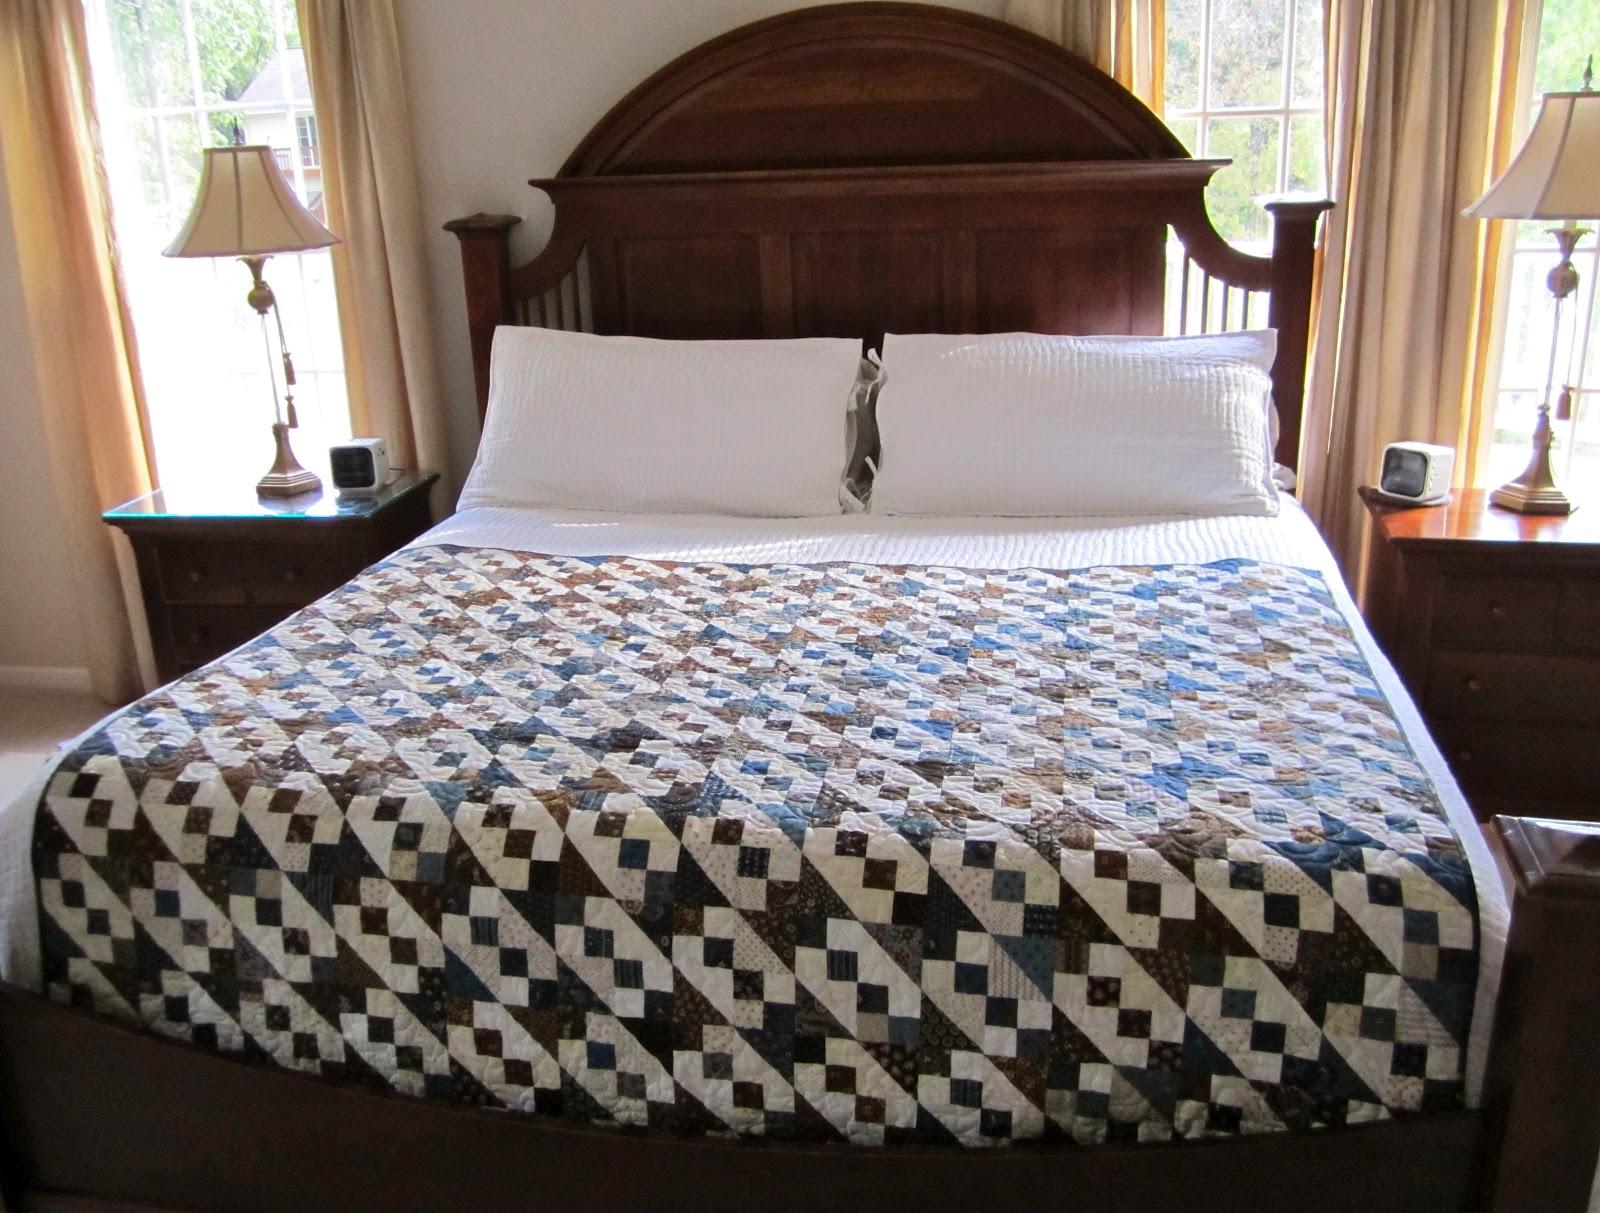 best woodworking plans and guide king size murphy bed hardware kit wooden plans. Black Bedroom Furniture Sets. Home Design Ideas